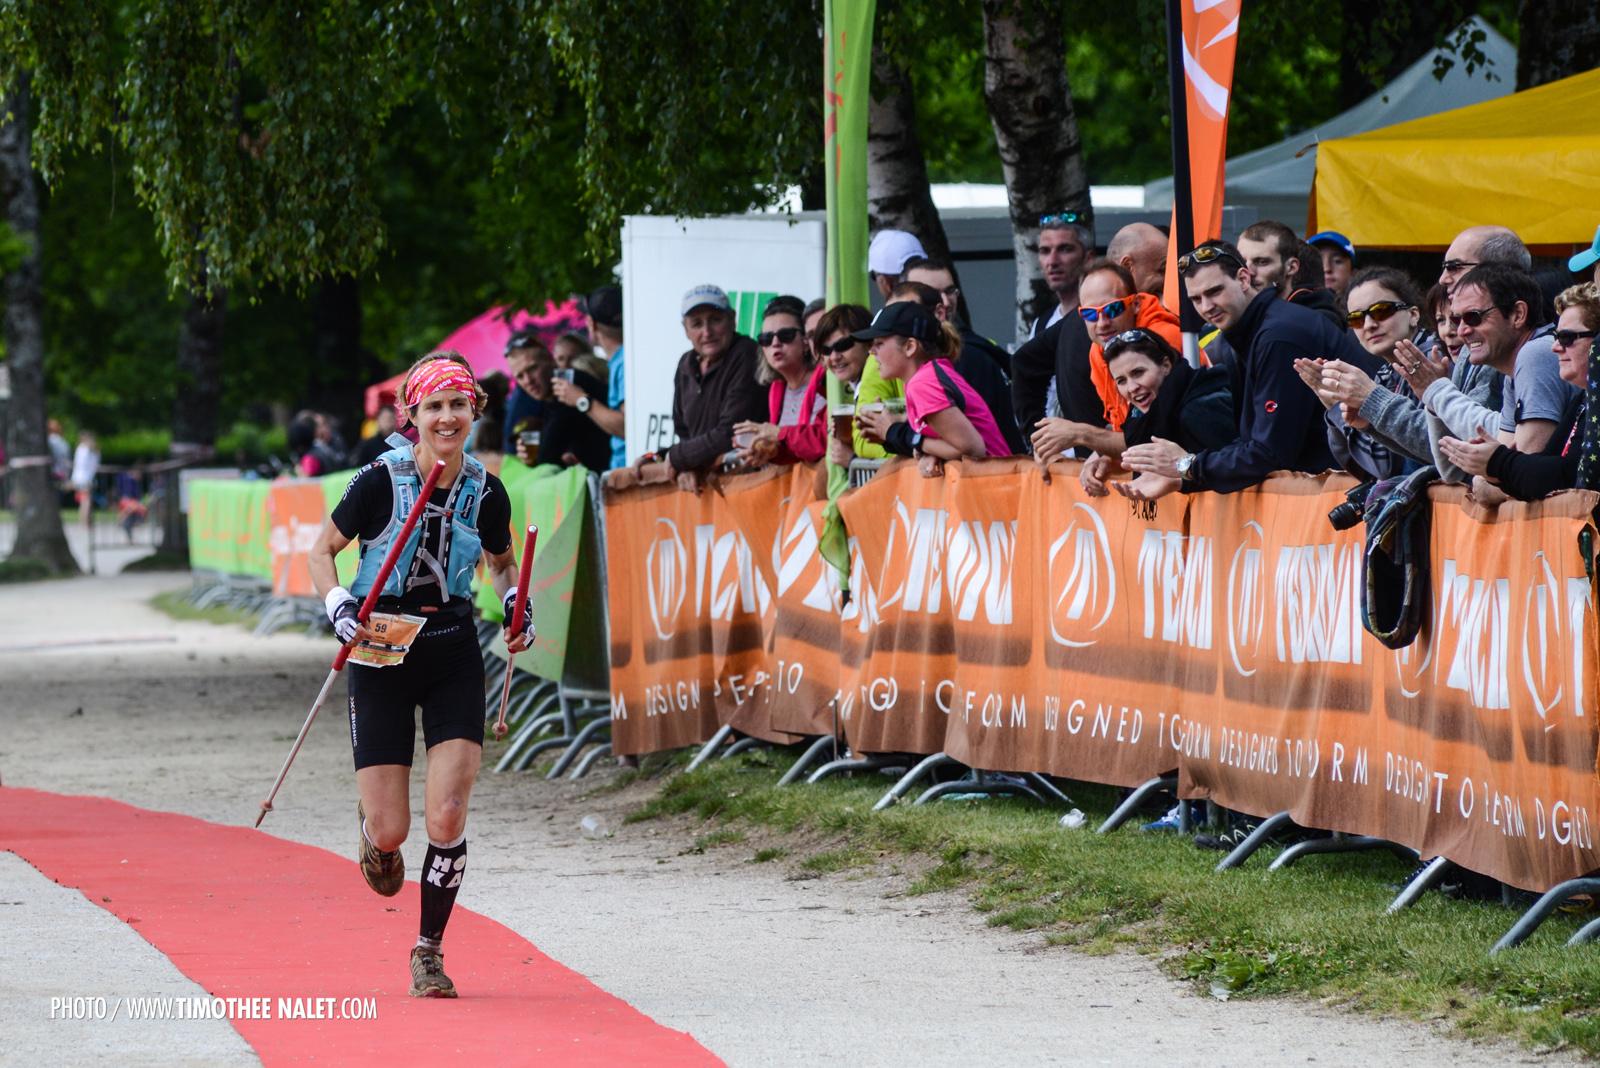 MaxiRace-Annecy-2014-Team-Hoka-Timothee-Nalet-1201.jpg